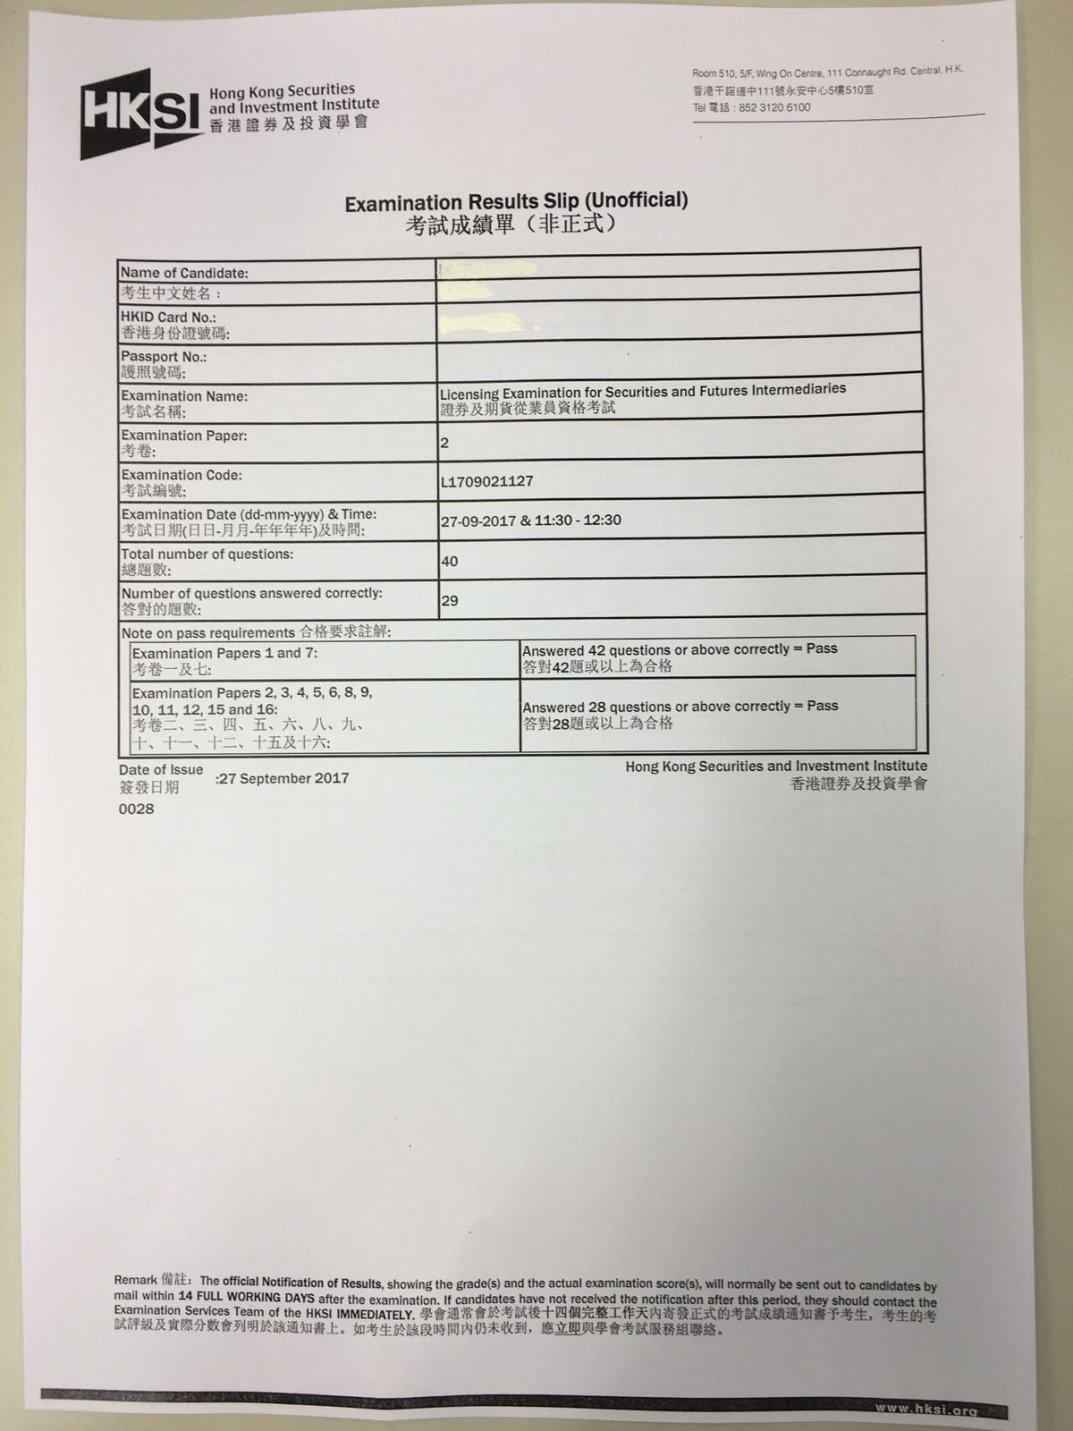 KML 27/9/2017 LE Paper 2 證券期貨從業員資格考試卷二 Pass